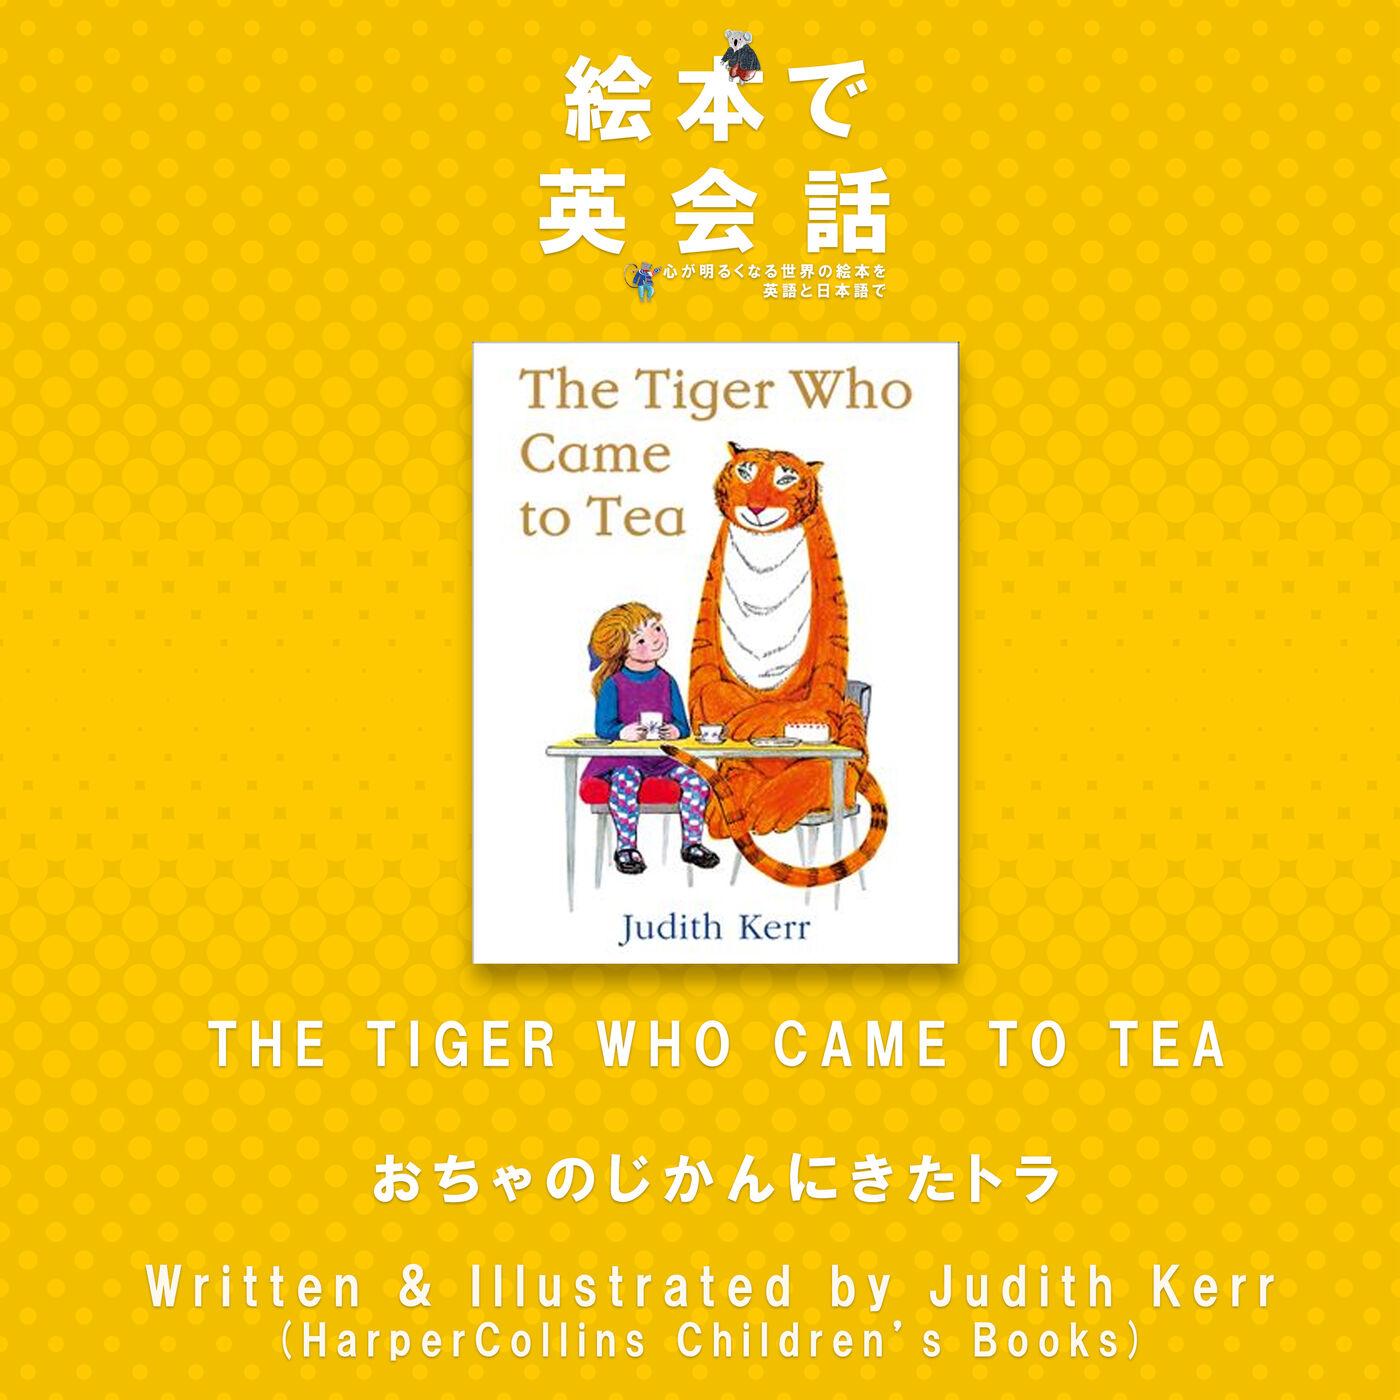 The Tiger Who Came To Tea ~おちゃの じかんに きた トラ~